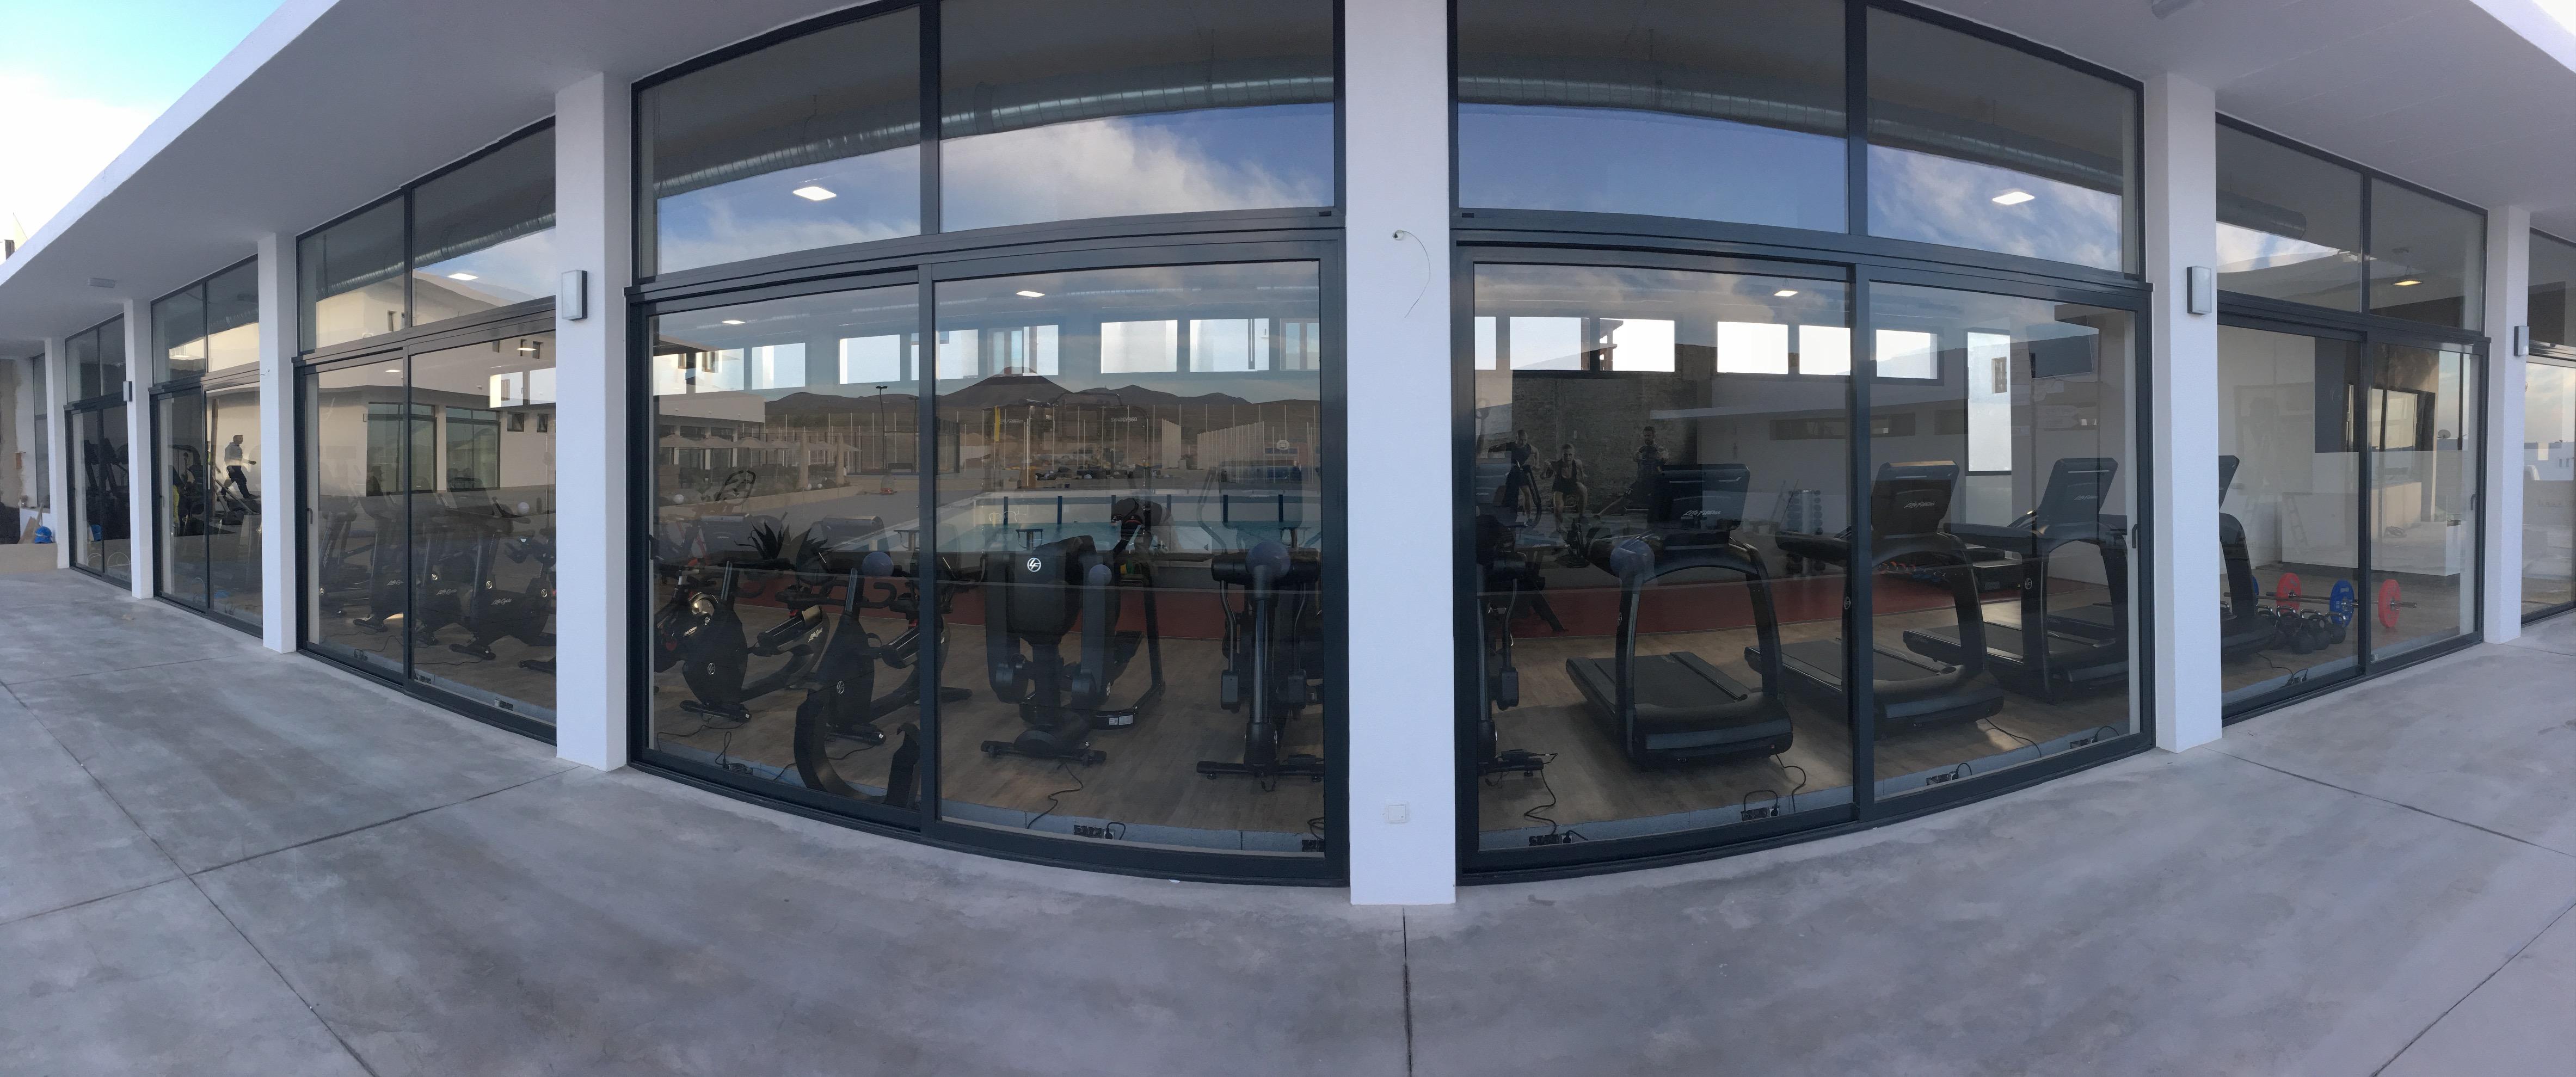 Centro deportivo zona gimnasio